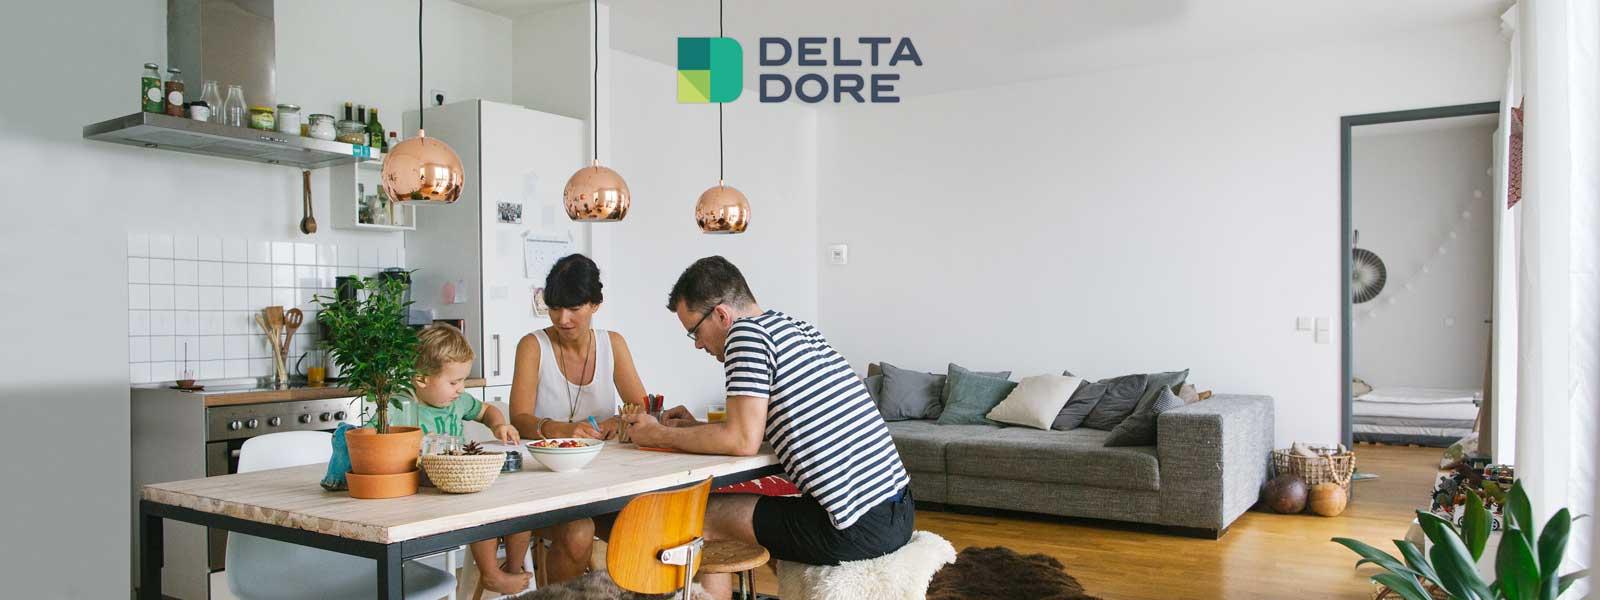 Banner brandzone Delta Dore